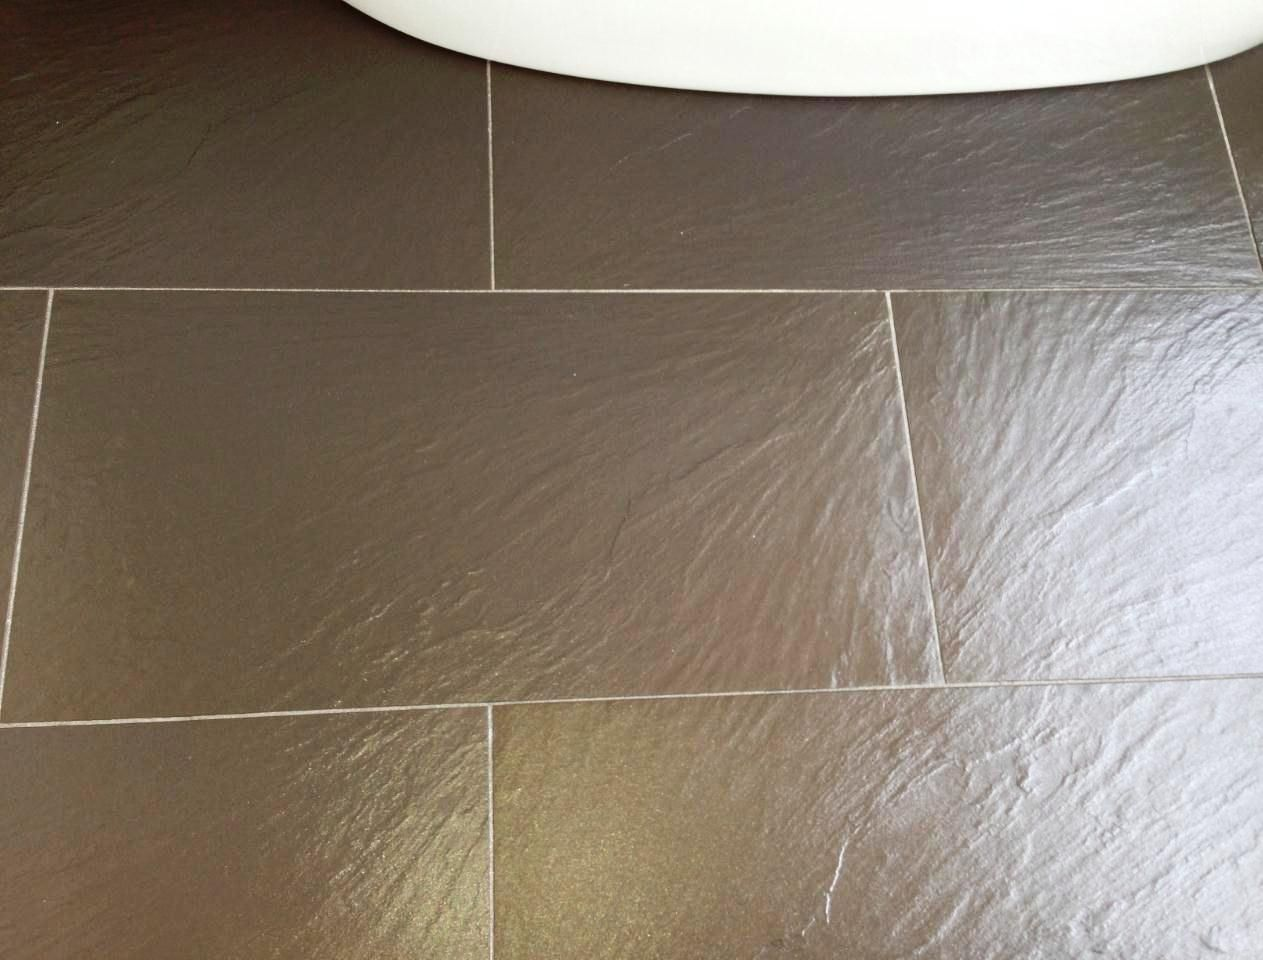 Seal tile floor porcelain httpnextsoft21 pinterest tile seal tile floor porcelain dailygadgetfo Choice Image